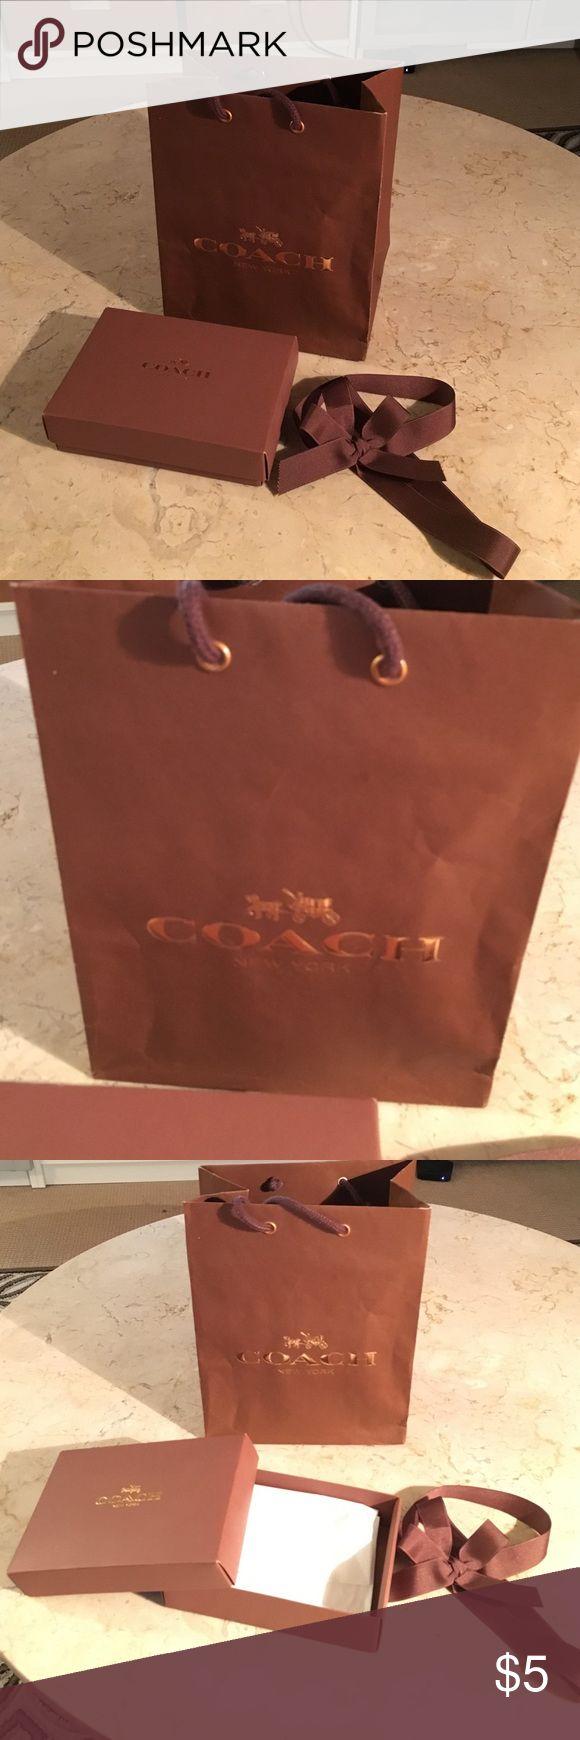 "Coach shopping bag, box and bow Coach shopping bag (7.75""w x 9.75""h x 4.75""d) box (7"" x 4.75"" x 1.75""h) and bow Coach Other"